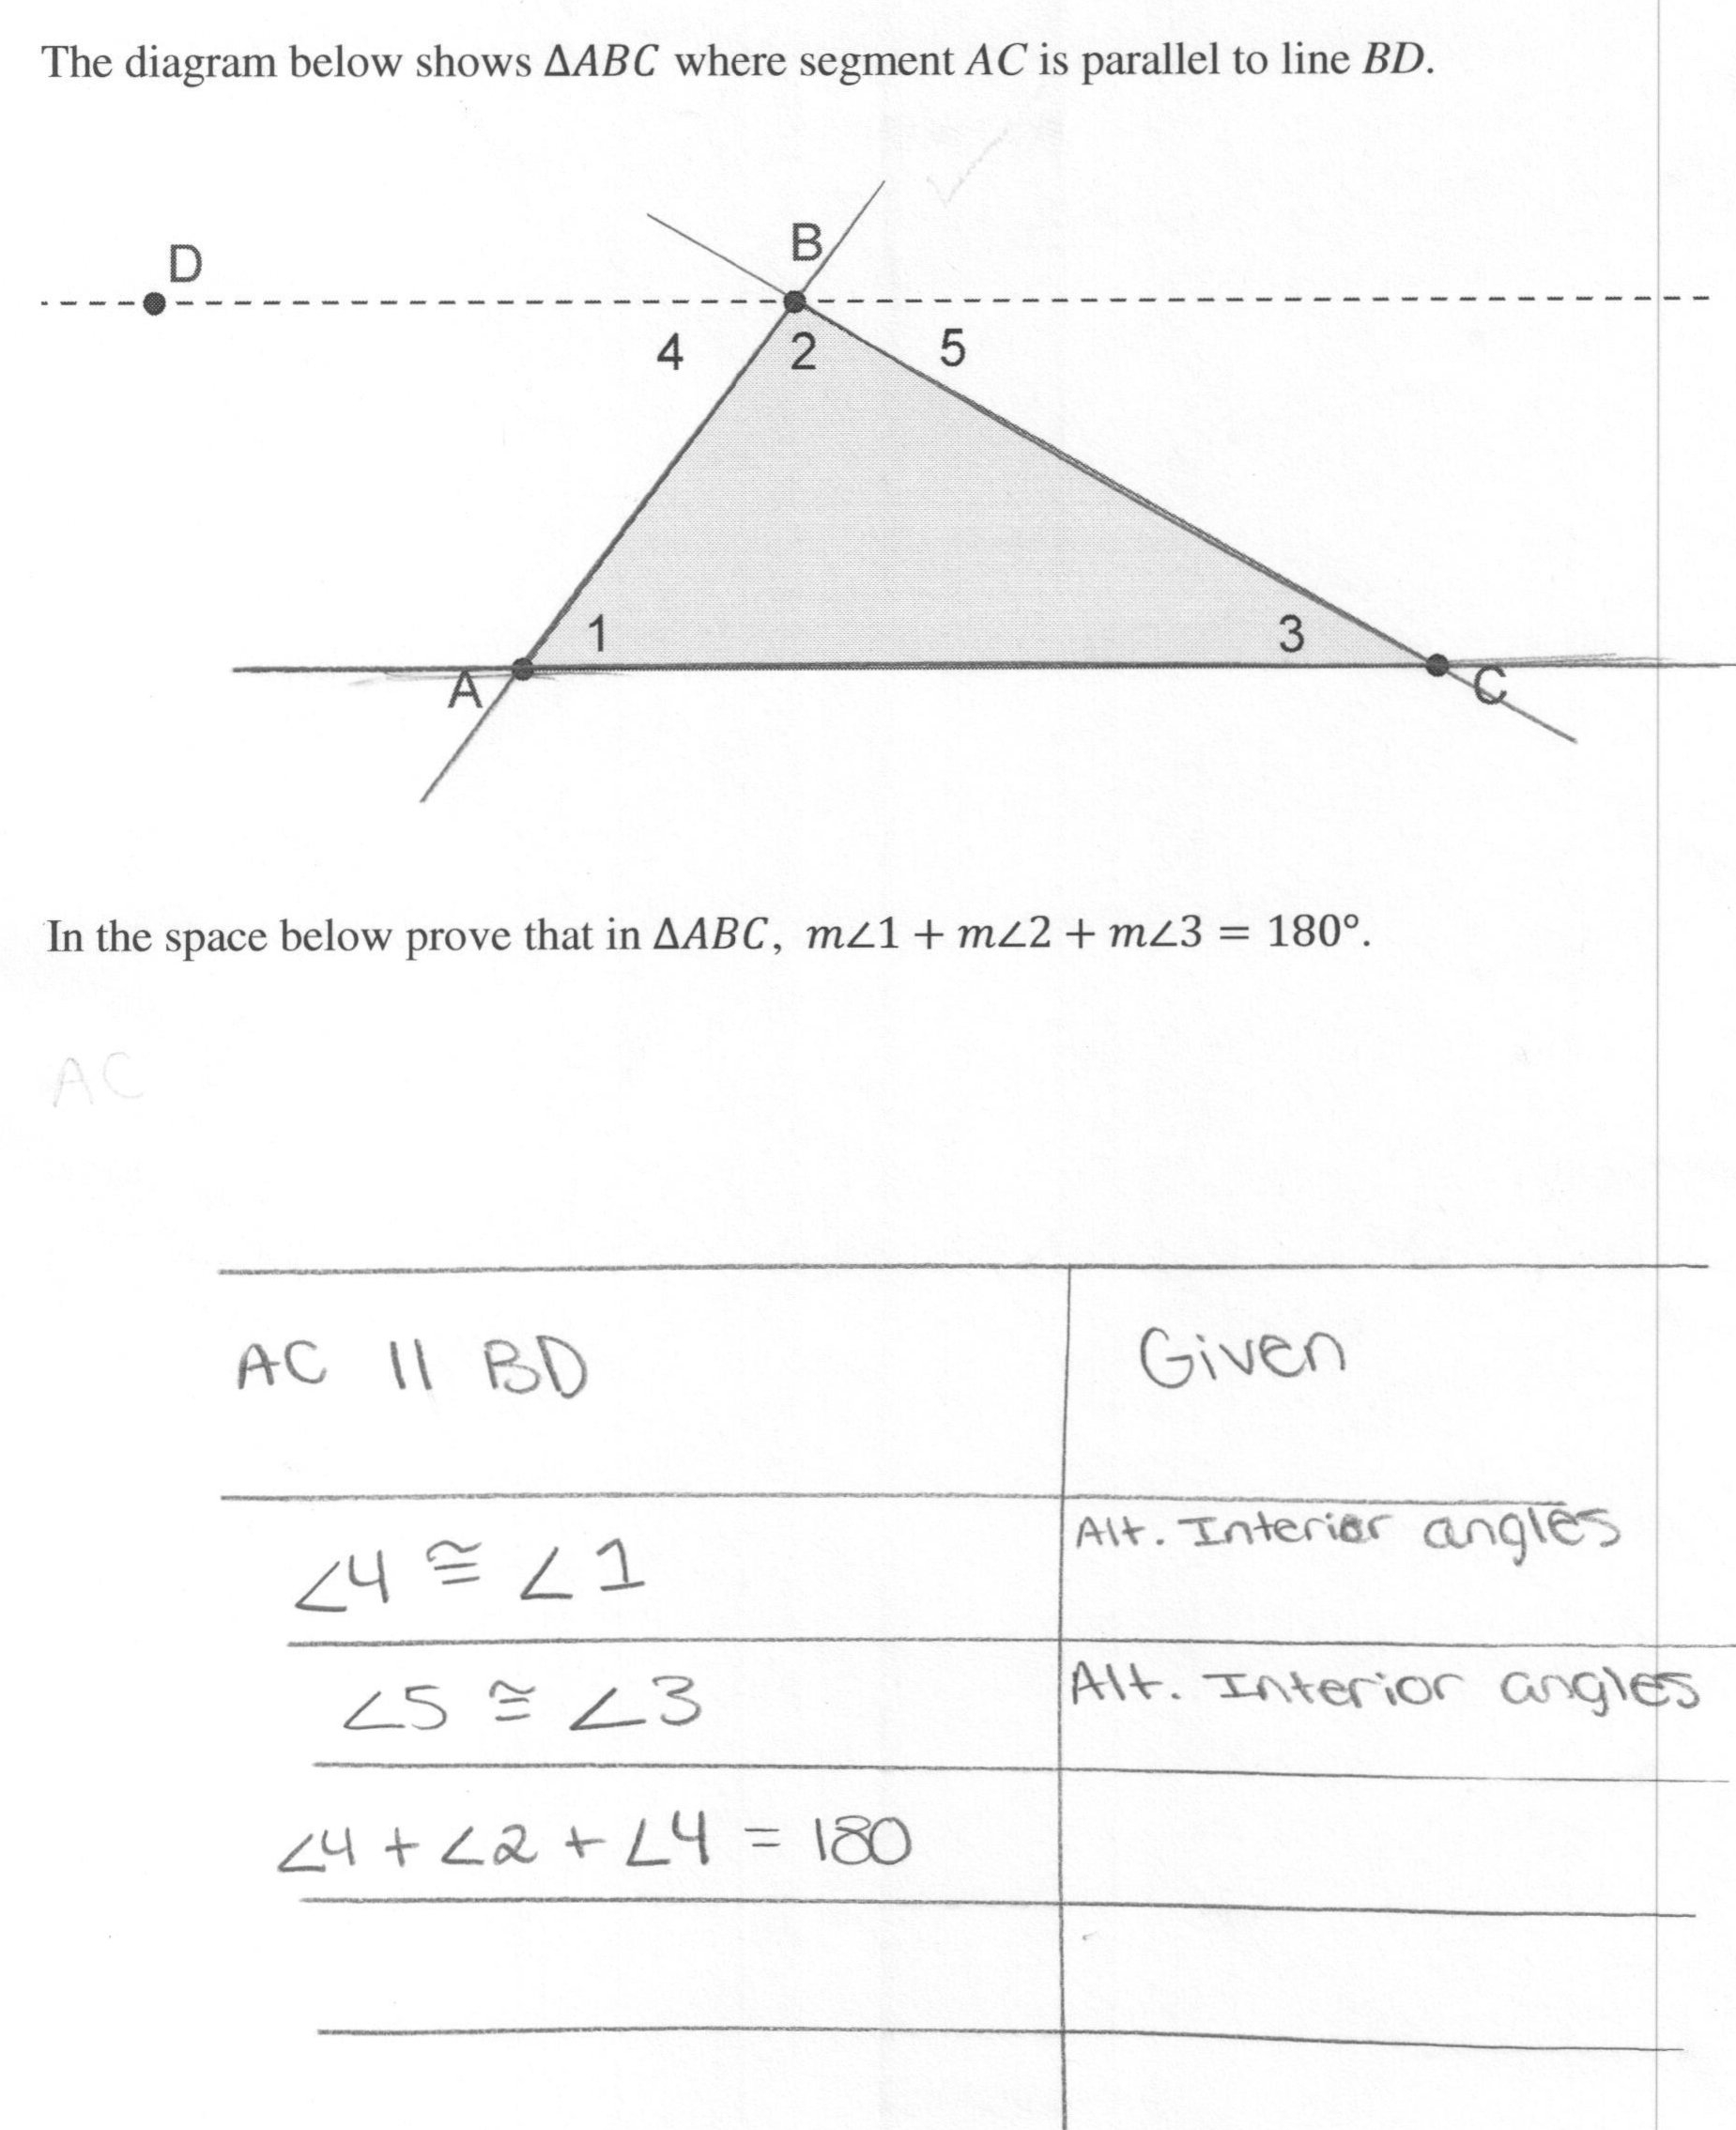 Worksheet Triangle Sum Theorem Worksheet Triangle Interior Angle Along With Triangle Interior Angle Worksheet Answers